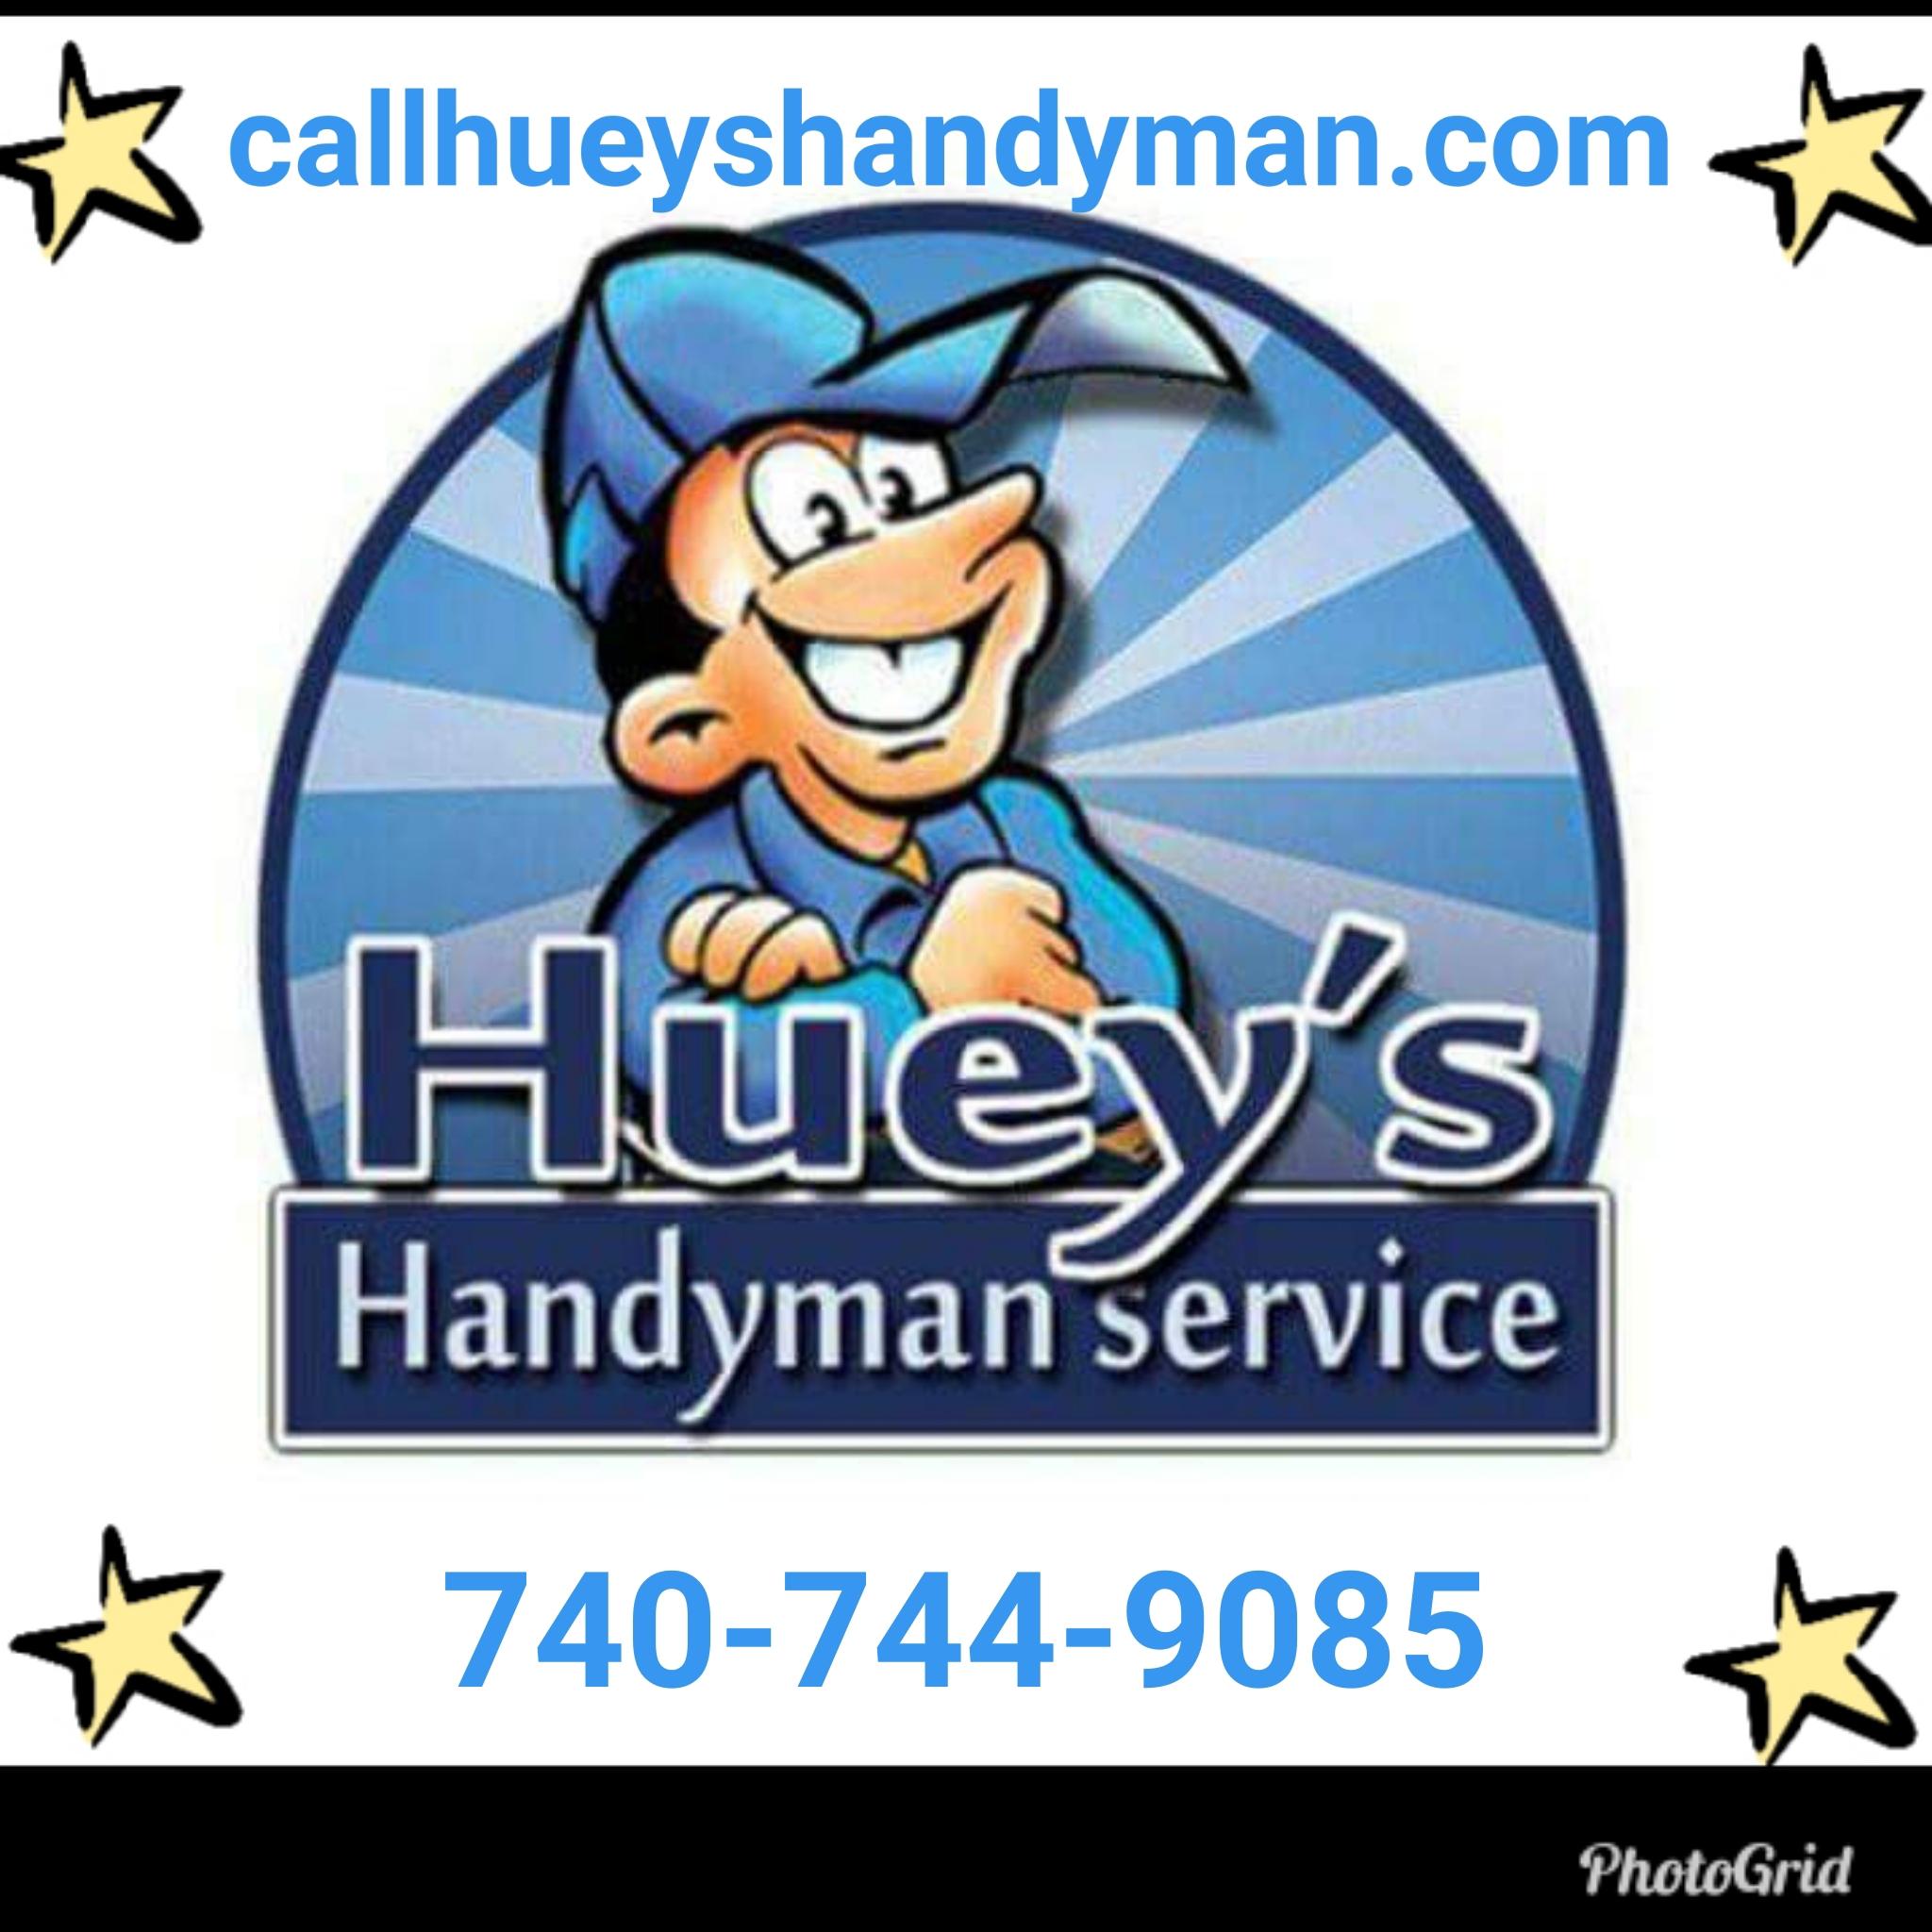 Huey's handyman service